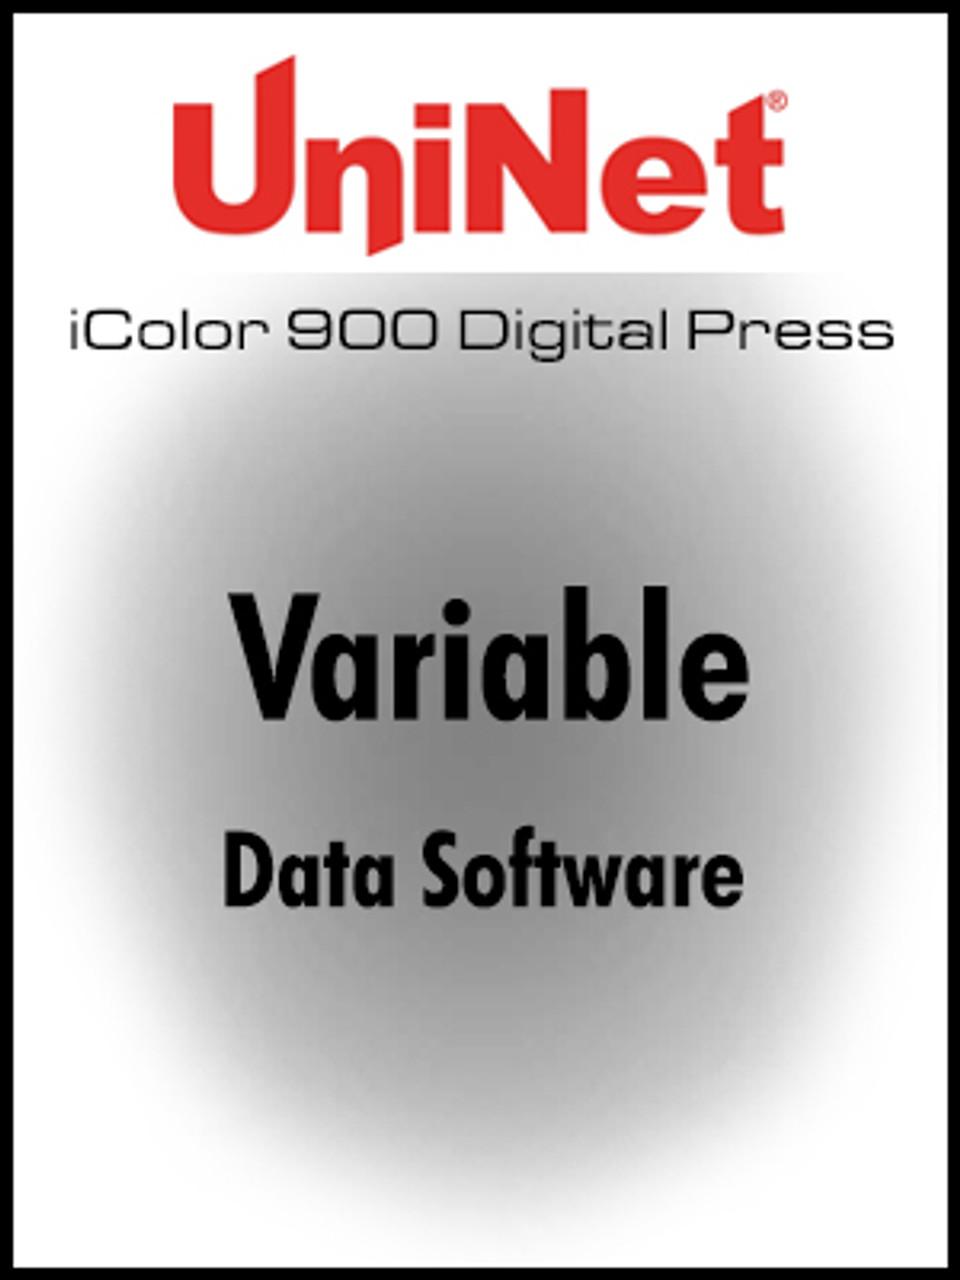 iColor 900 Digital Press Variable Data Software